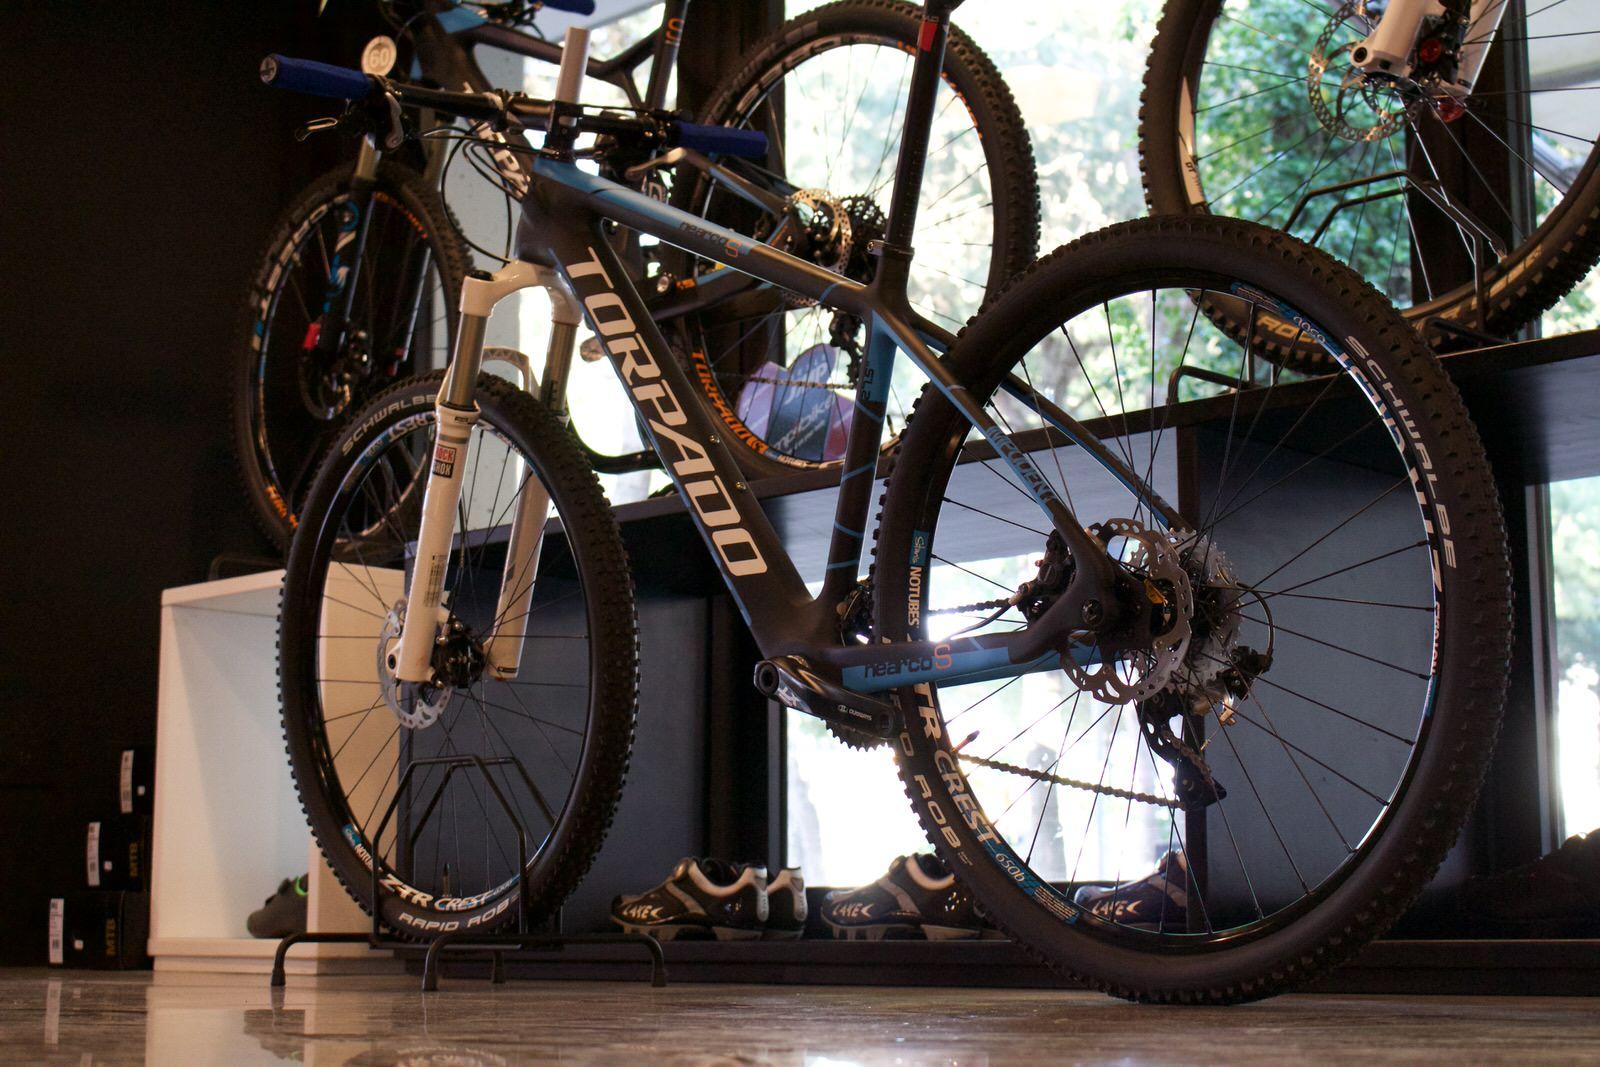 sessantallora_store_mima_milanomarittima_bici_torpado_bike_ride_ribot_mtb